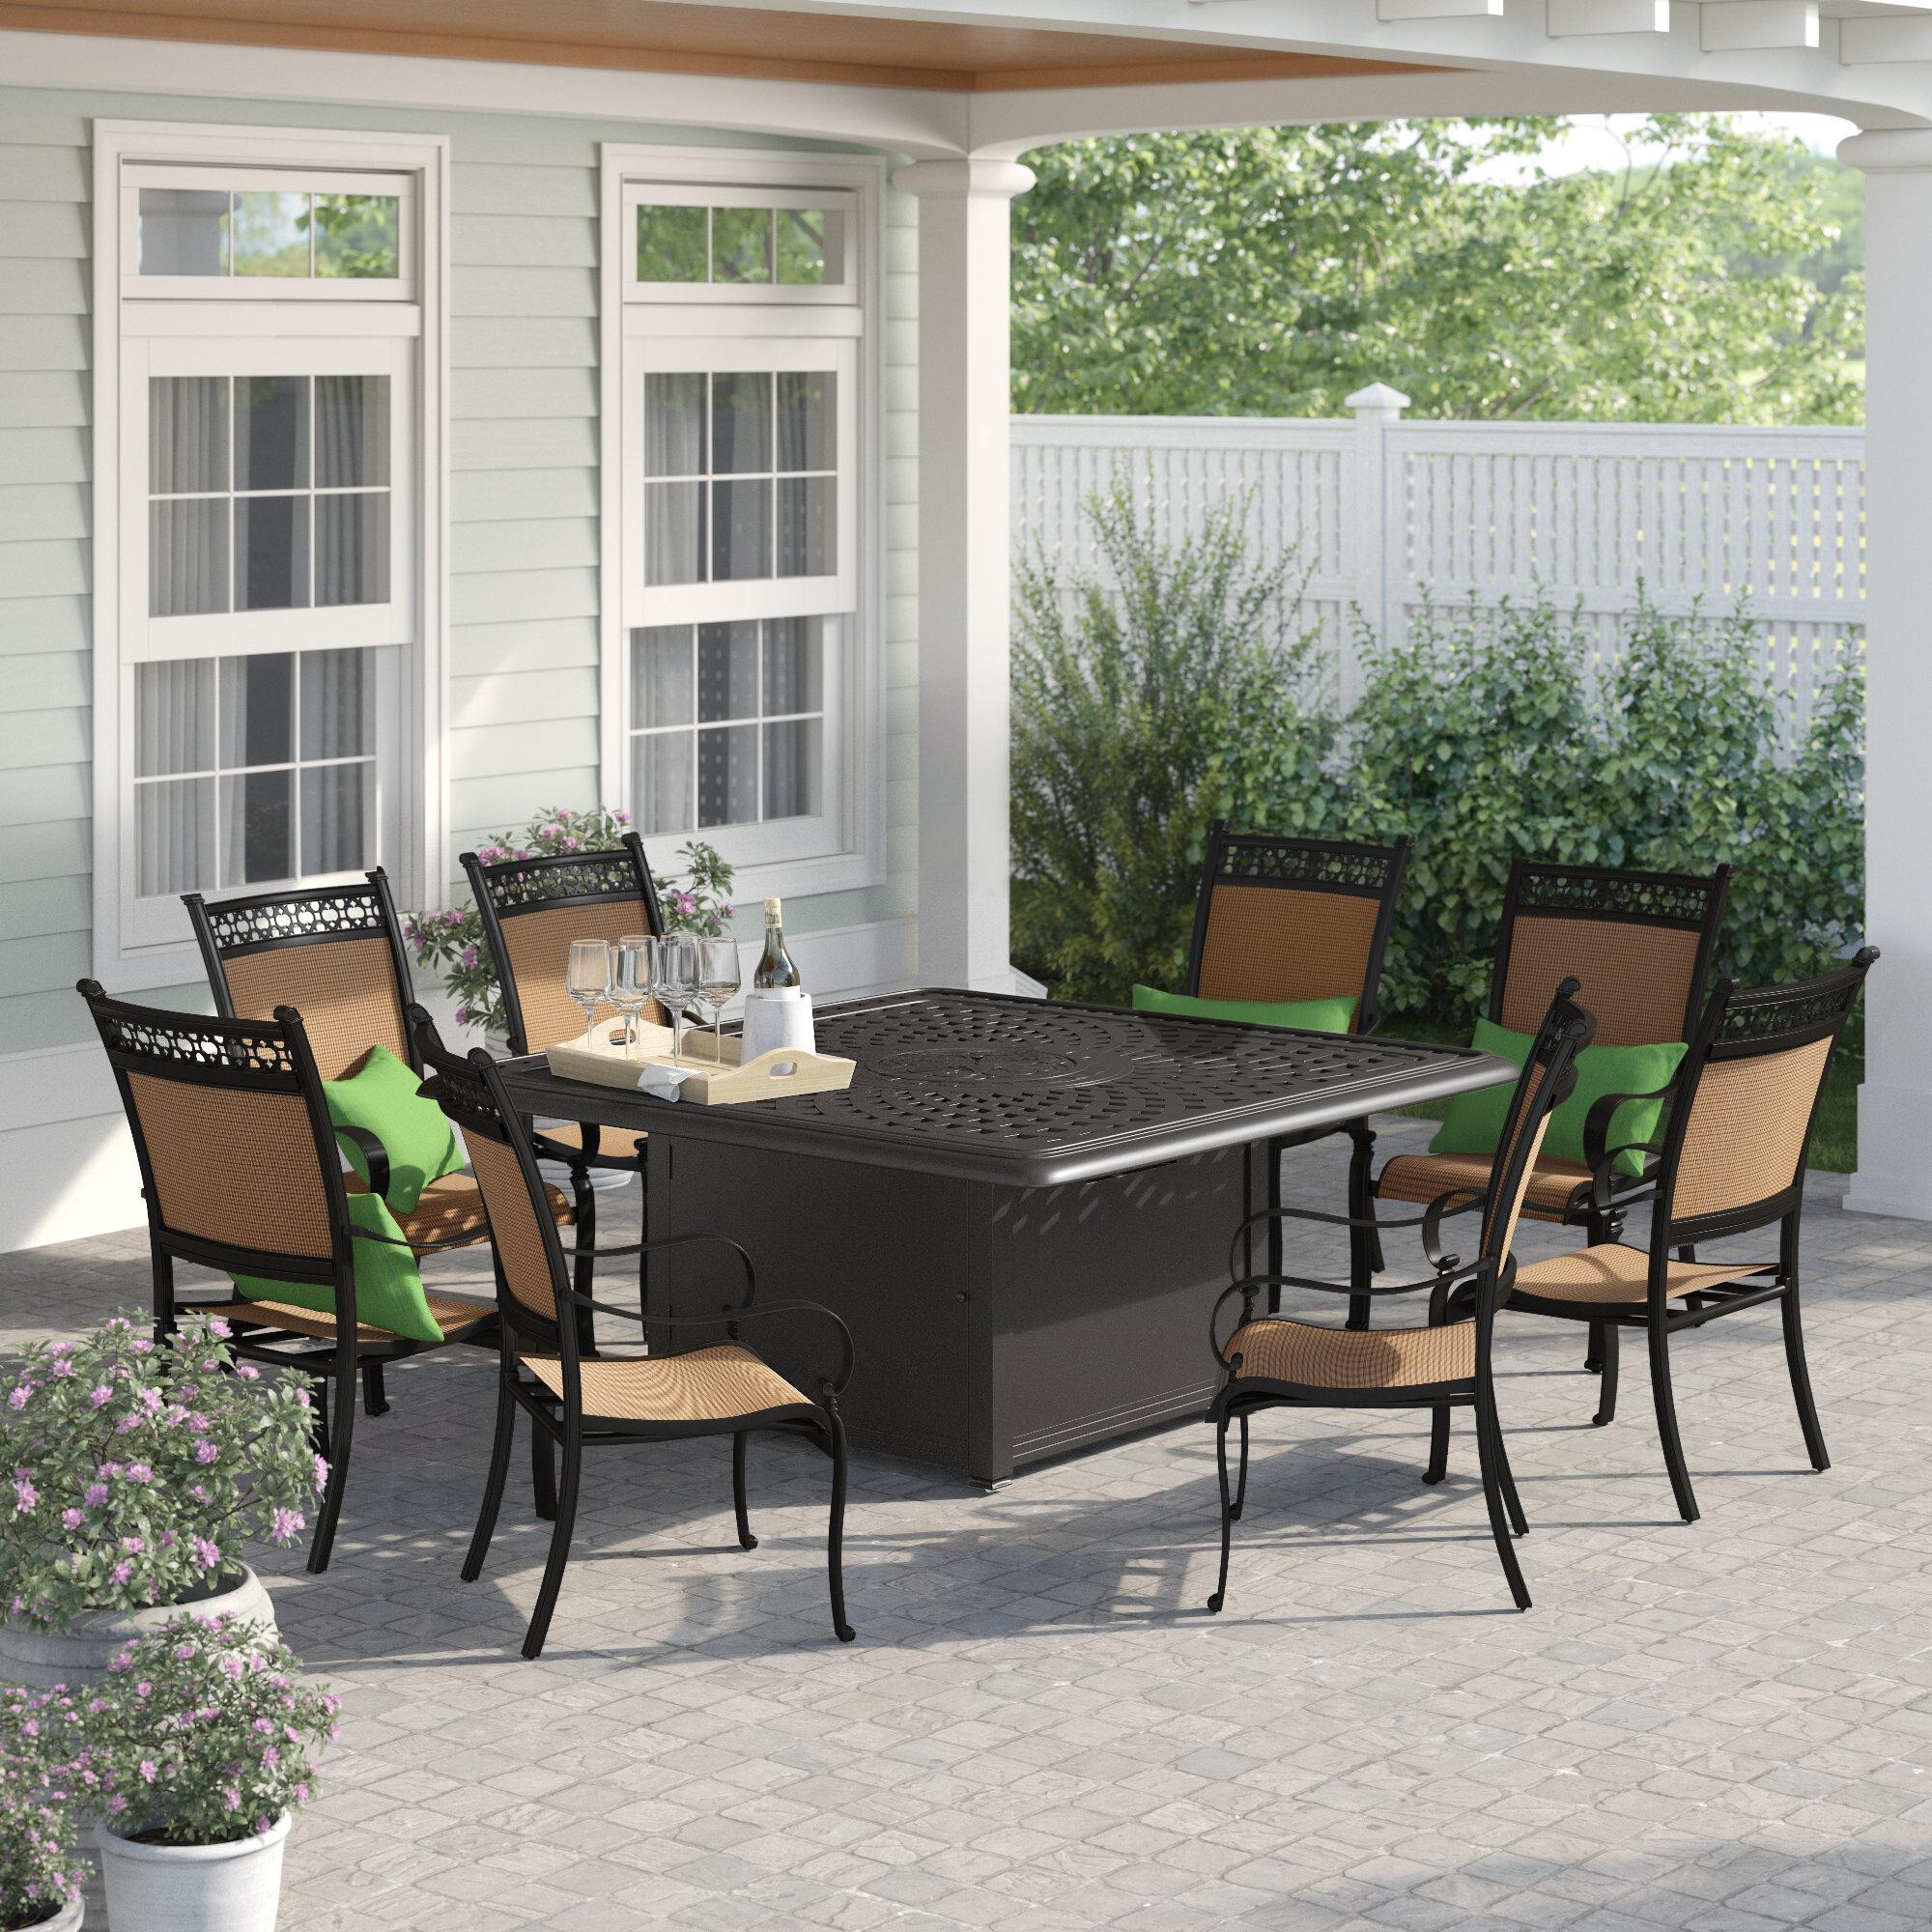 Groovy Curacao 9 Piece Metal Frame Dining Set Ibusinesslaw Wood Chair Design Ideas Ibusinesslaworg